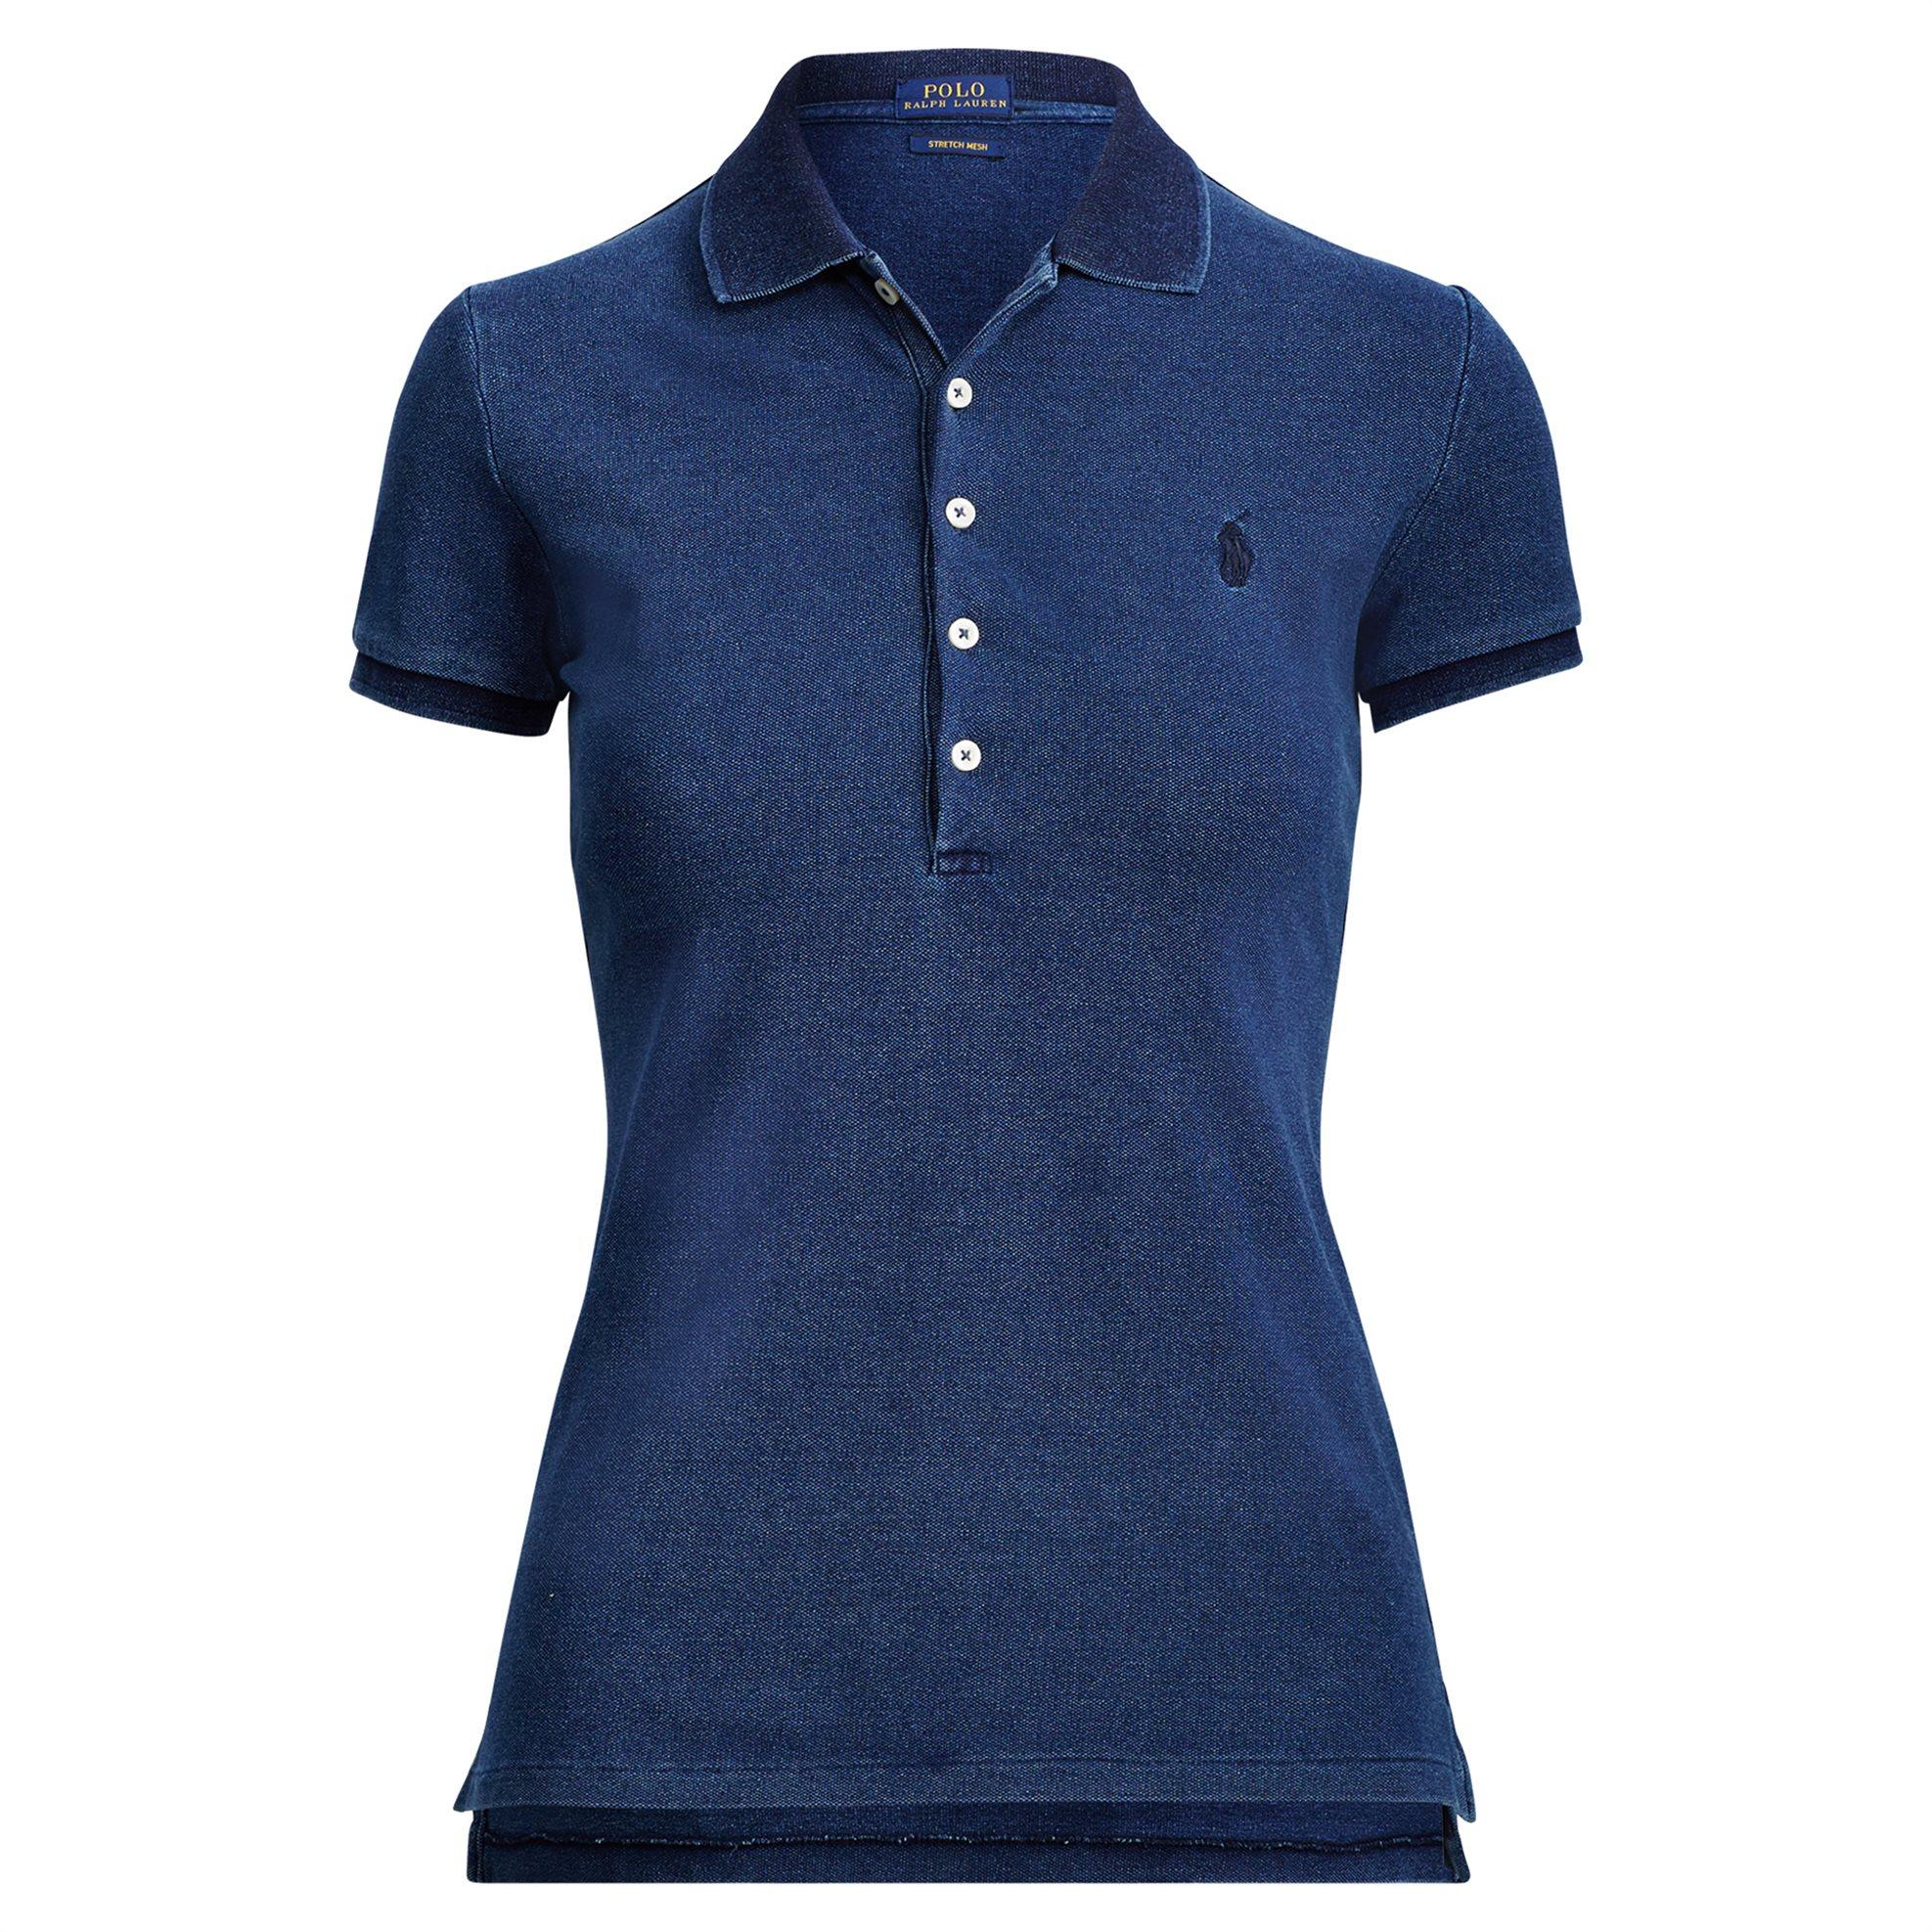 Polo Ralph Lauren γυναικεία μπλούζα Slim Fit Stretch Polo Shirt - 211505654102 - γυναικα   ρουχα   tops   μπλούζες   πόλο